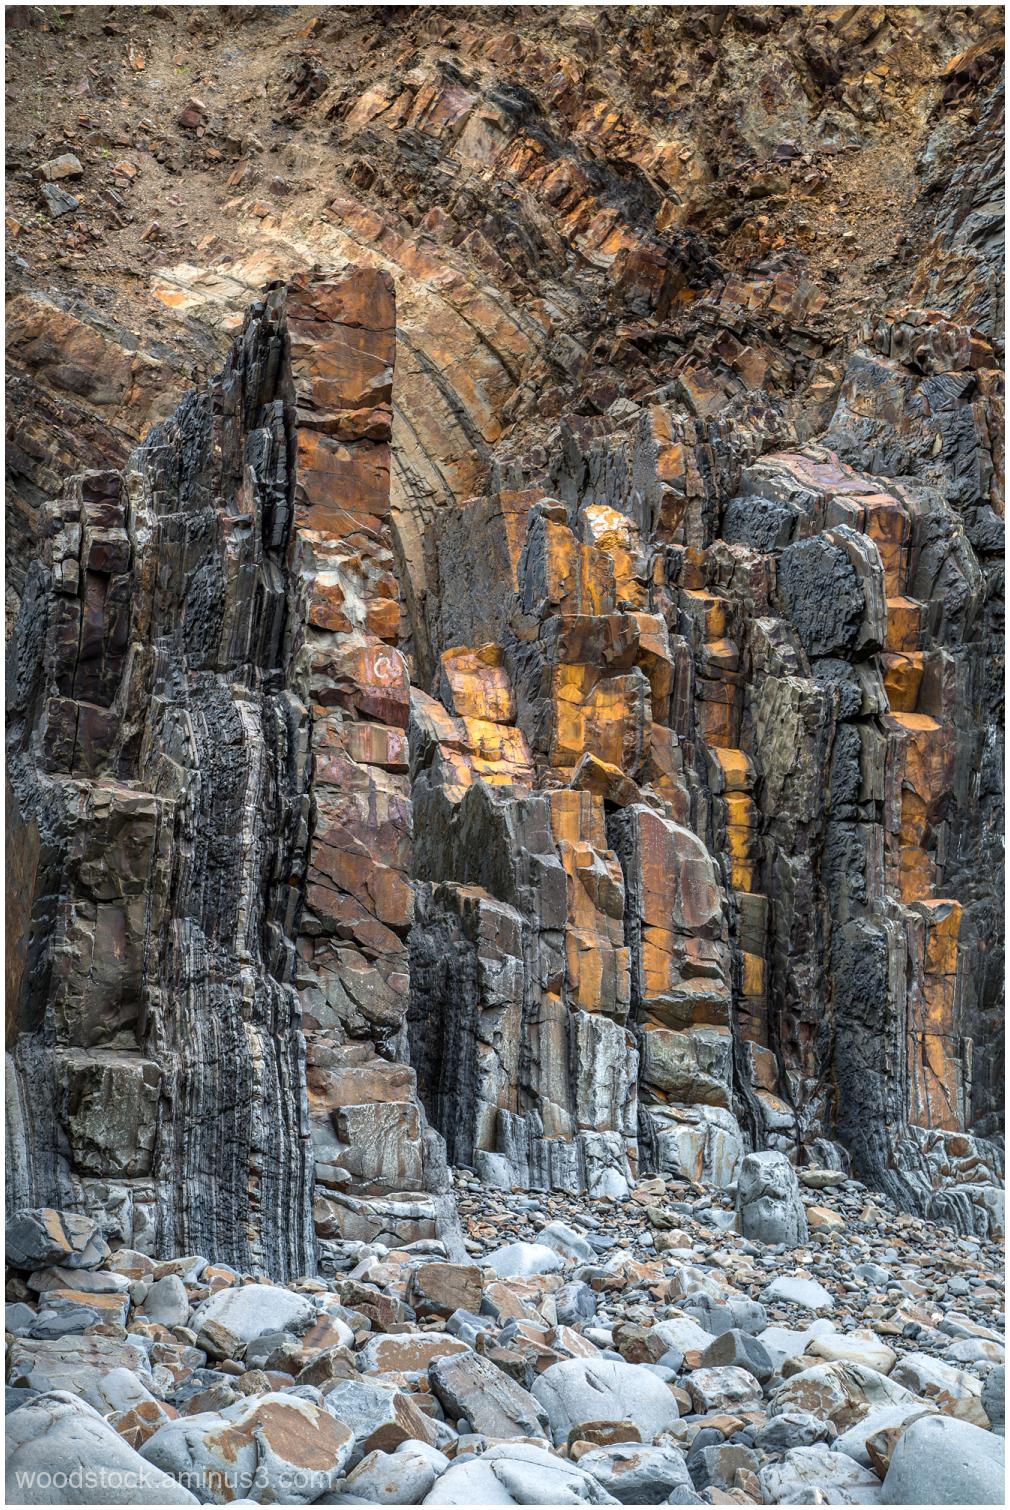 'On The Rocks'